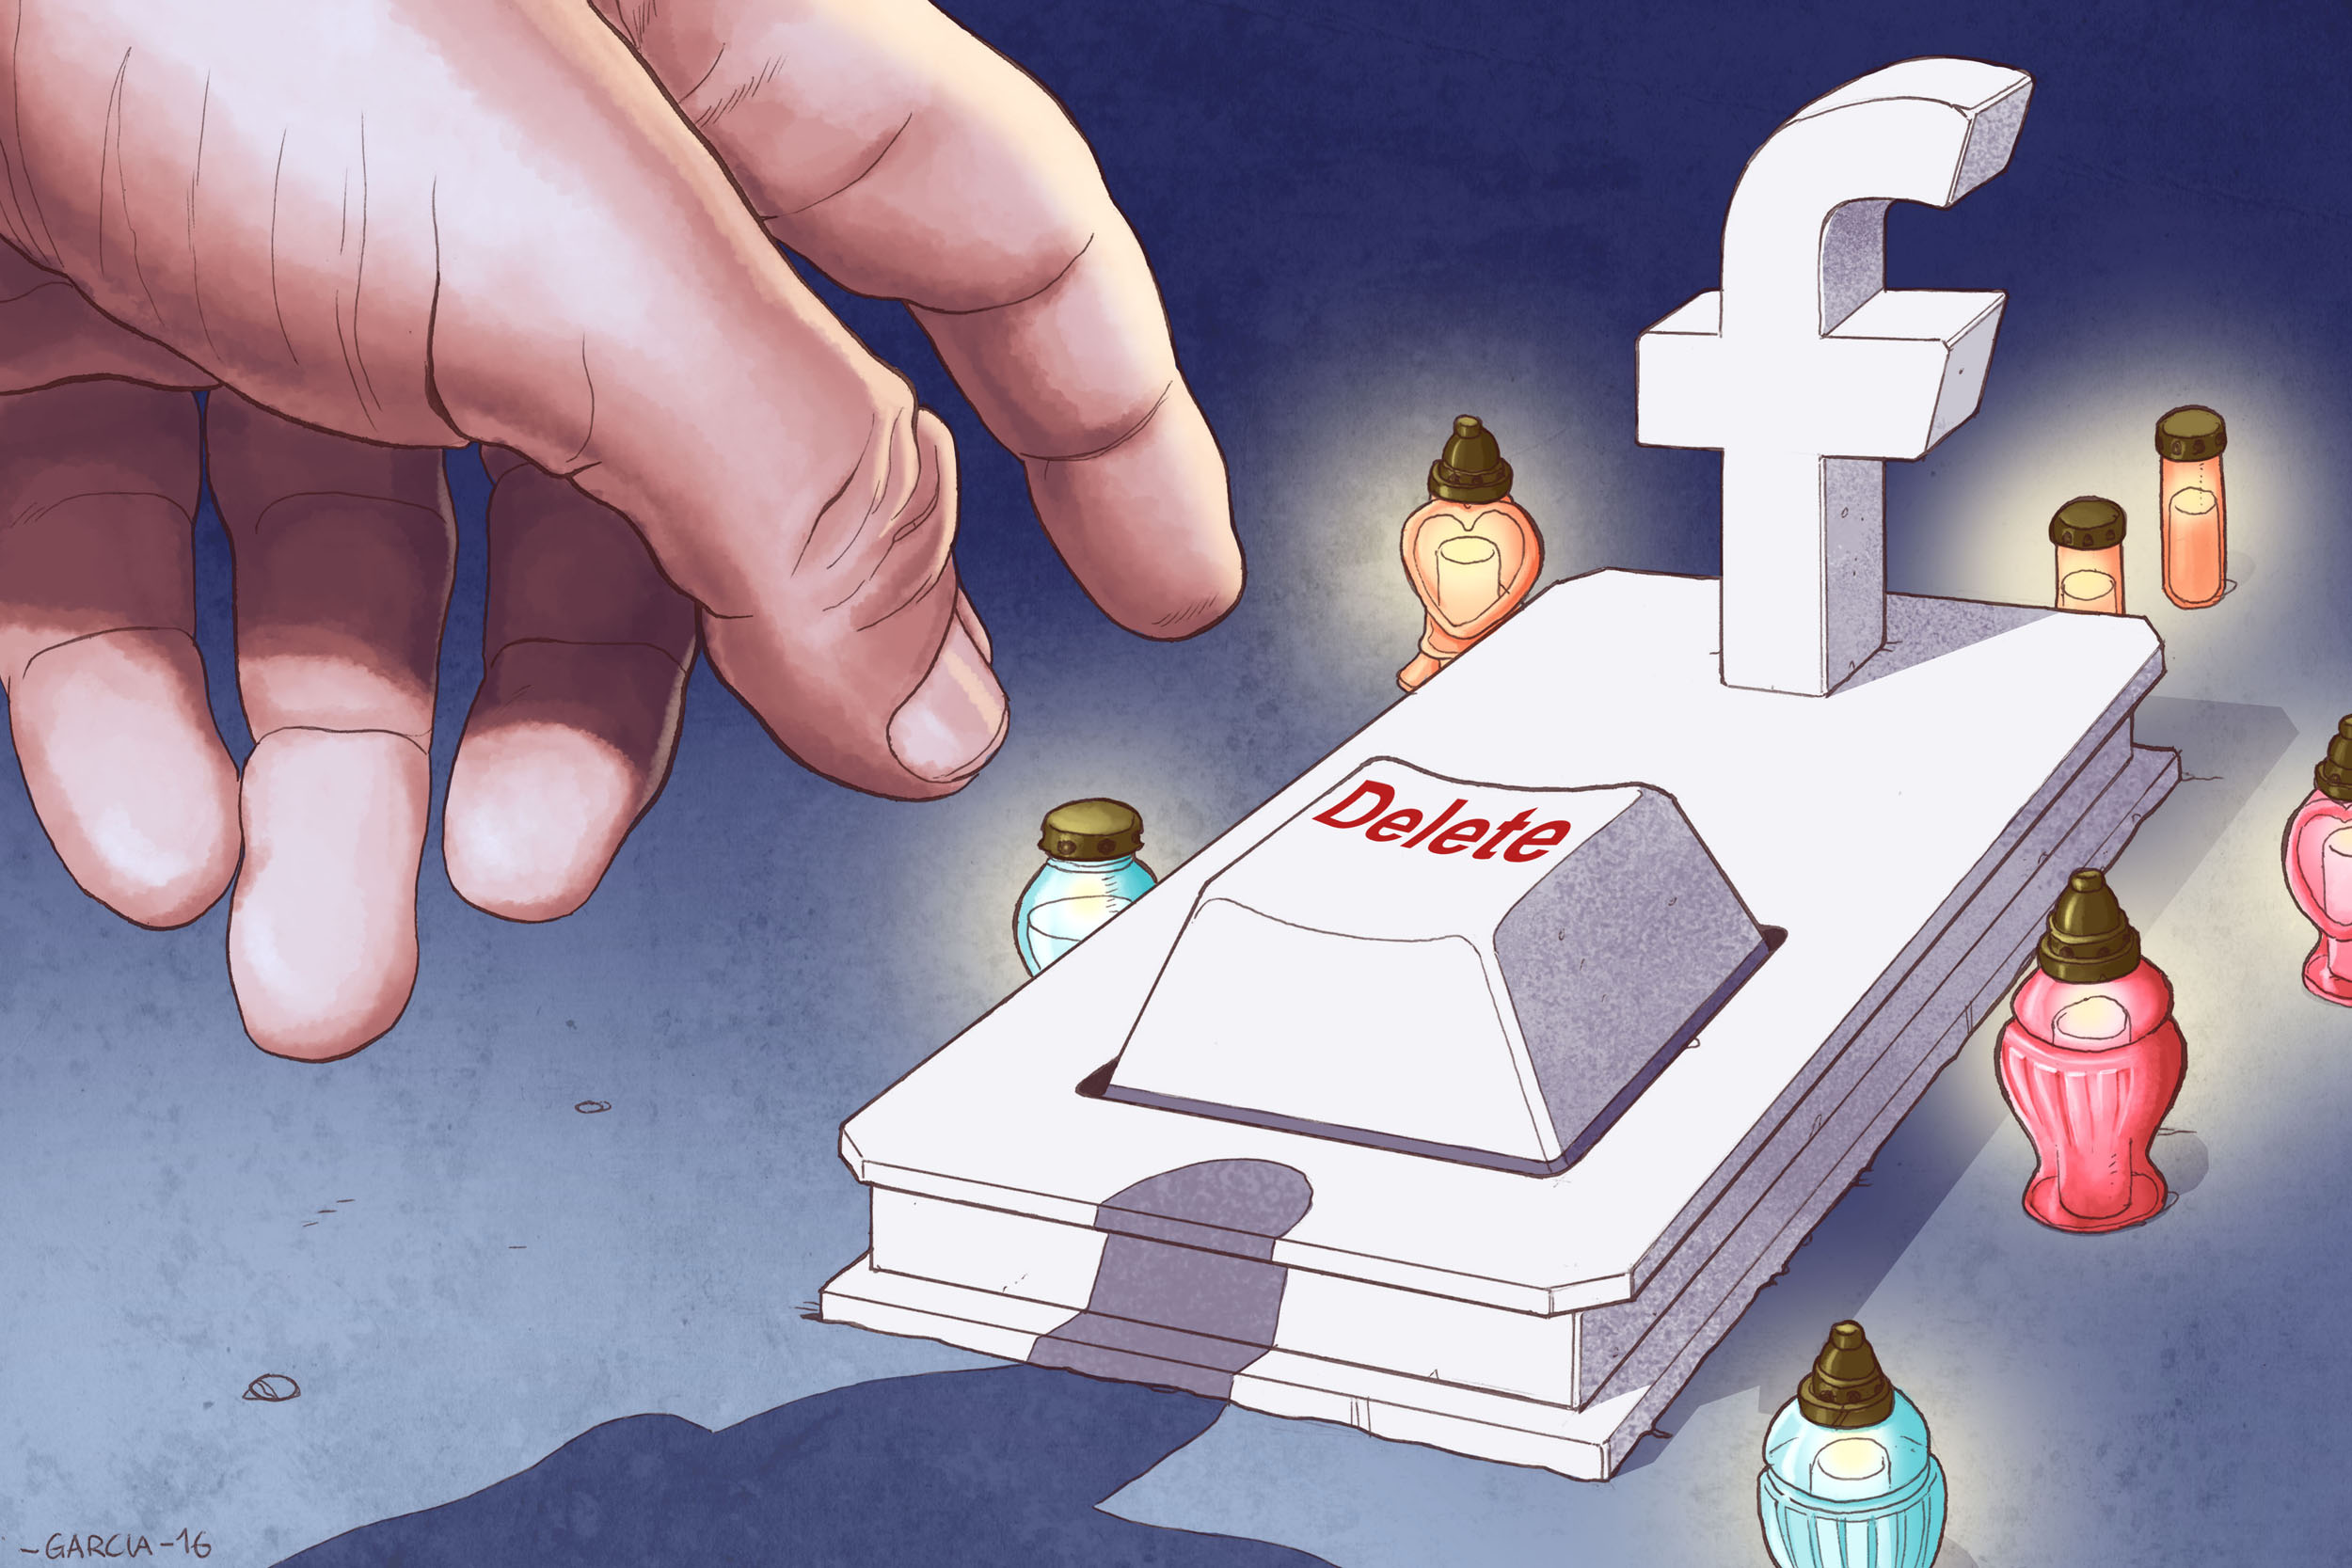 Daniel Garcia Art Illustration Facebook Death Profile Grave Press 01